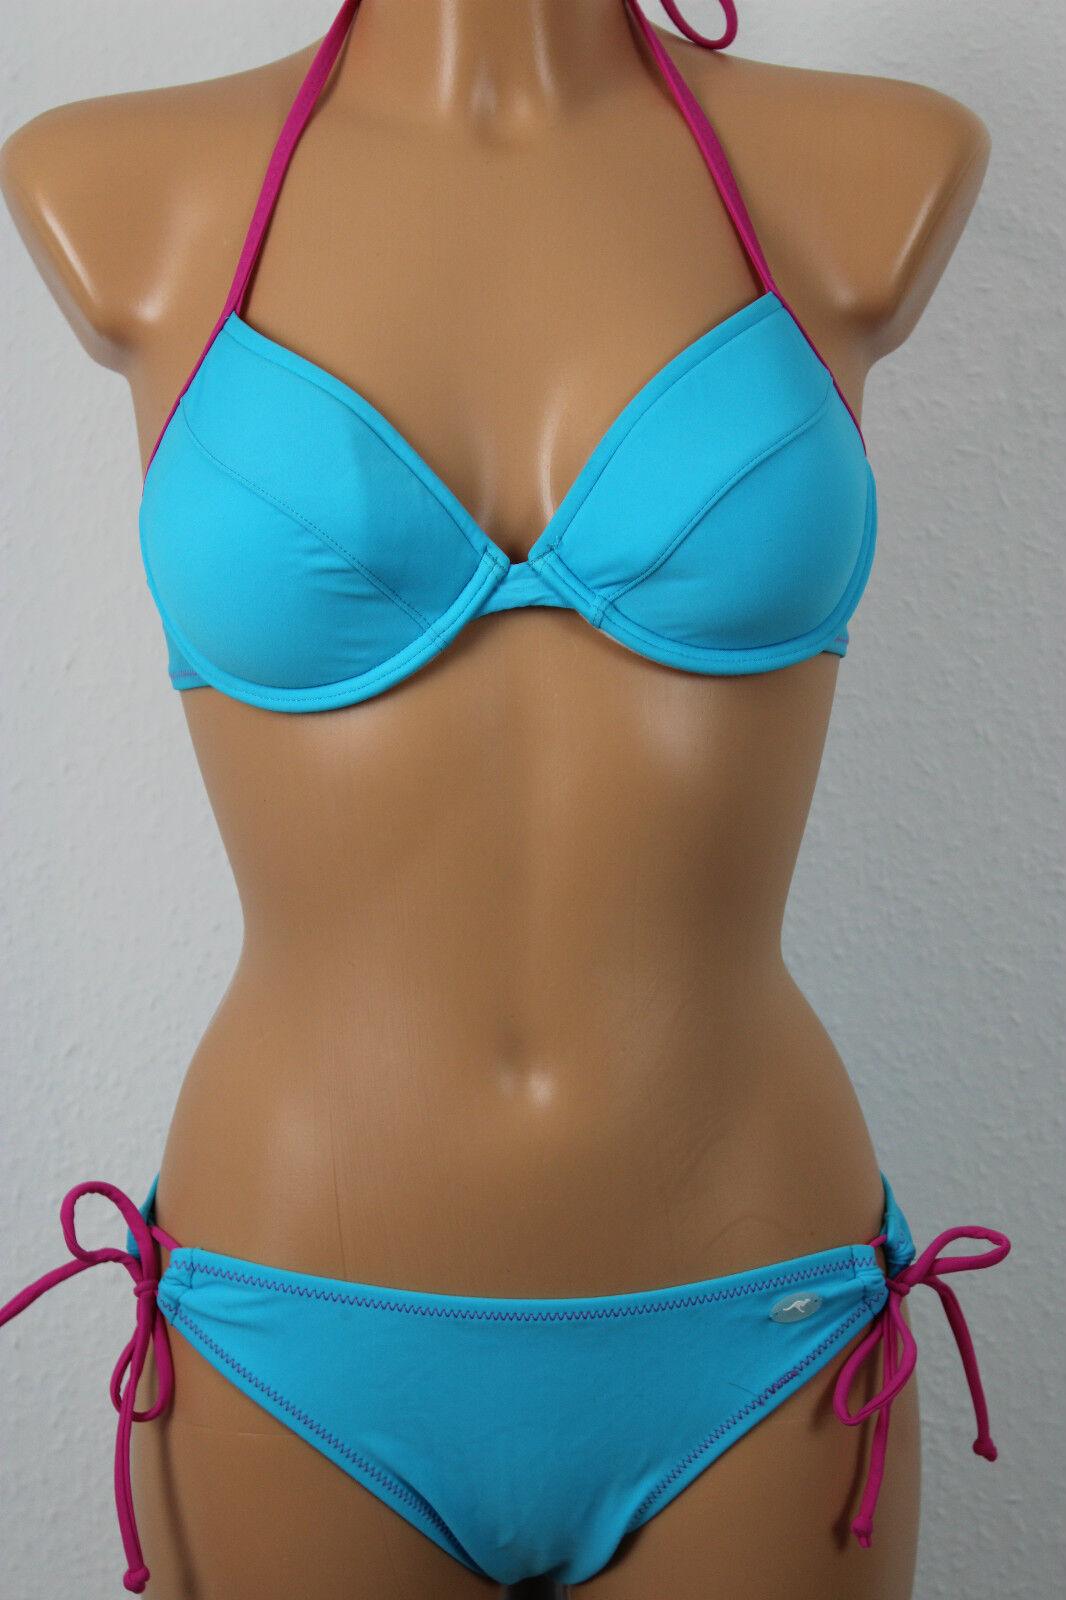 Kangaroos Sexy Push-Up Neck Underwired Bikini Size 34 Cup An AQUA NEW A11-053